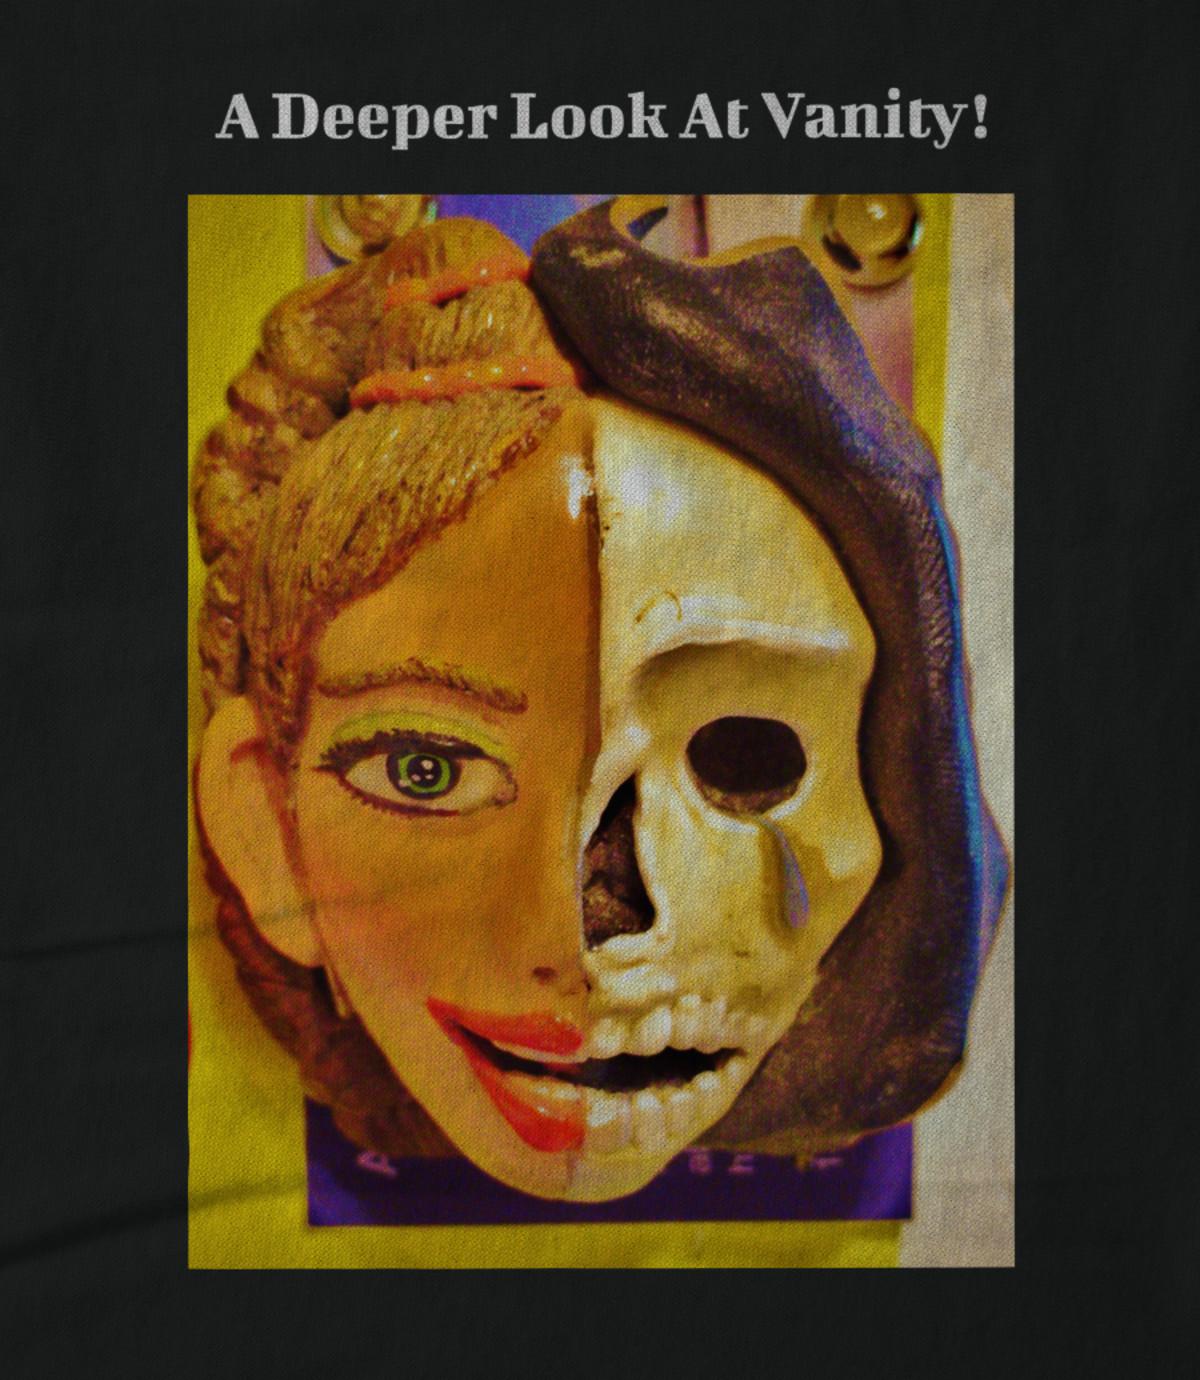 Matthew f  blowers iii a deeper look at vanity  1505395676